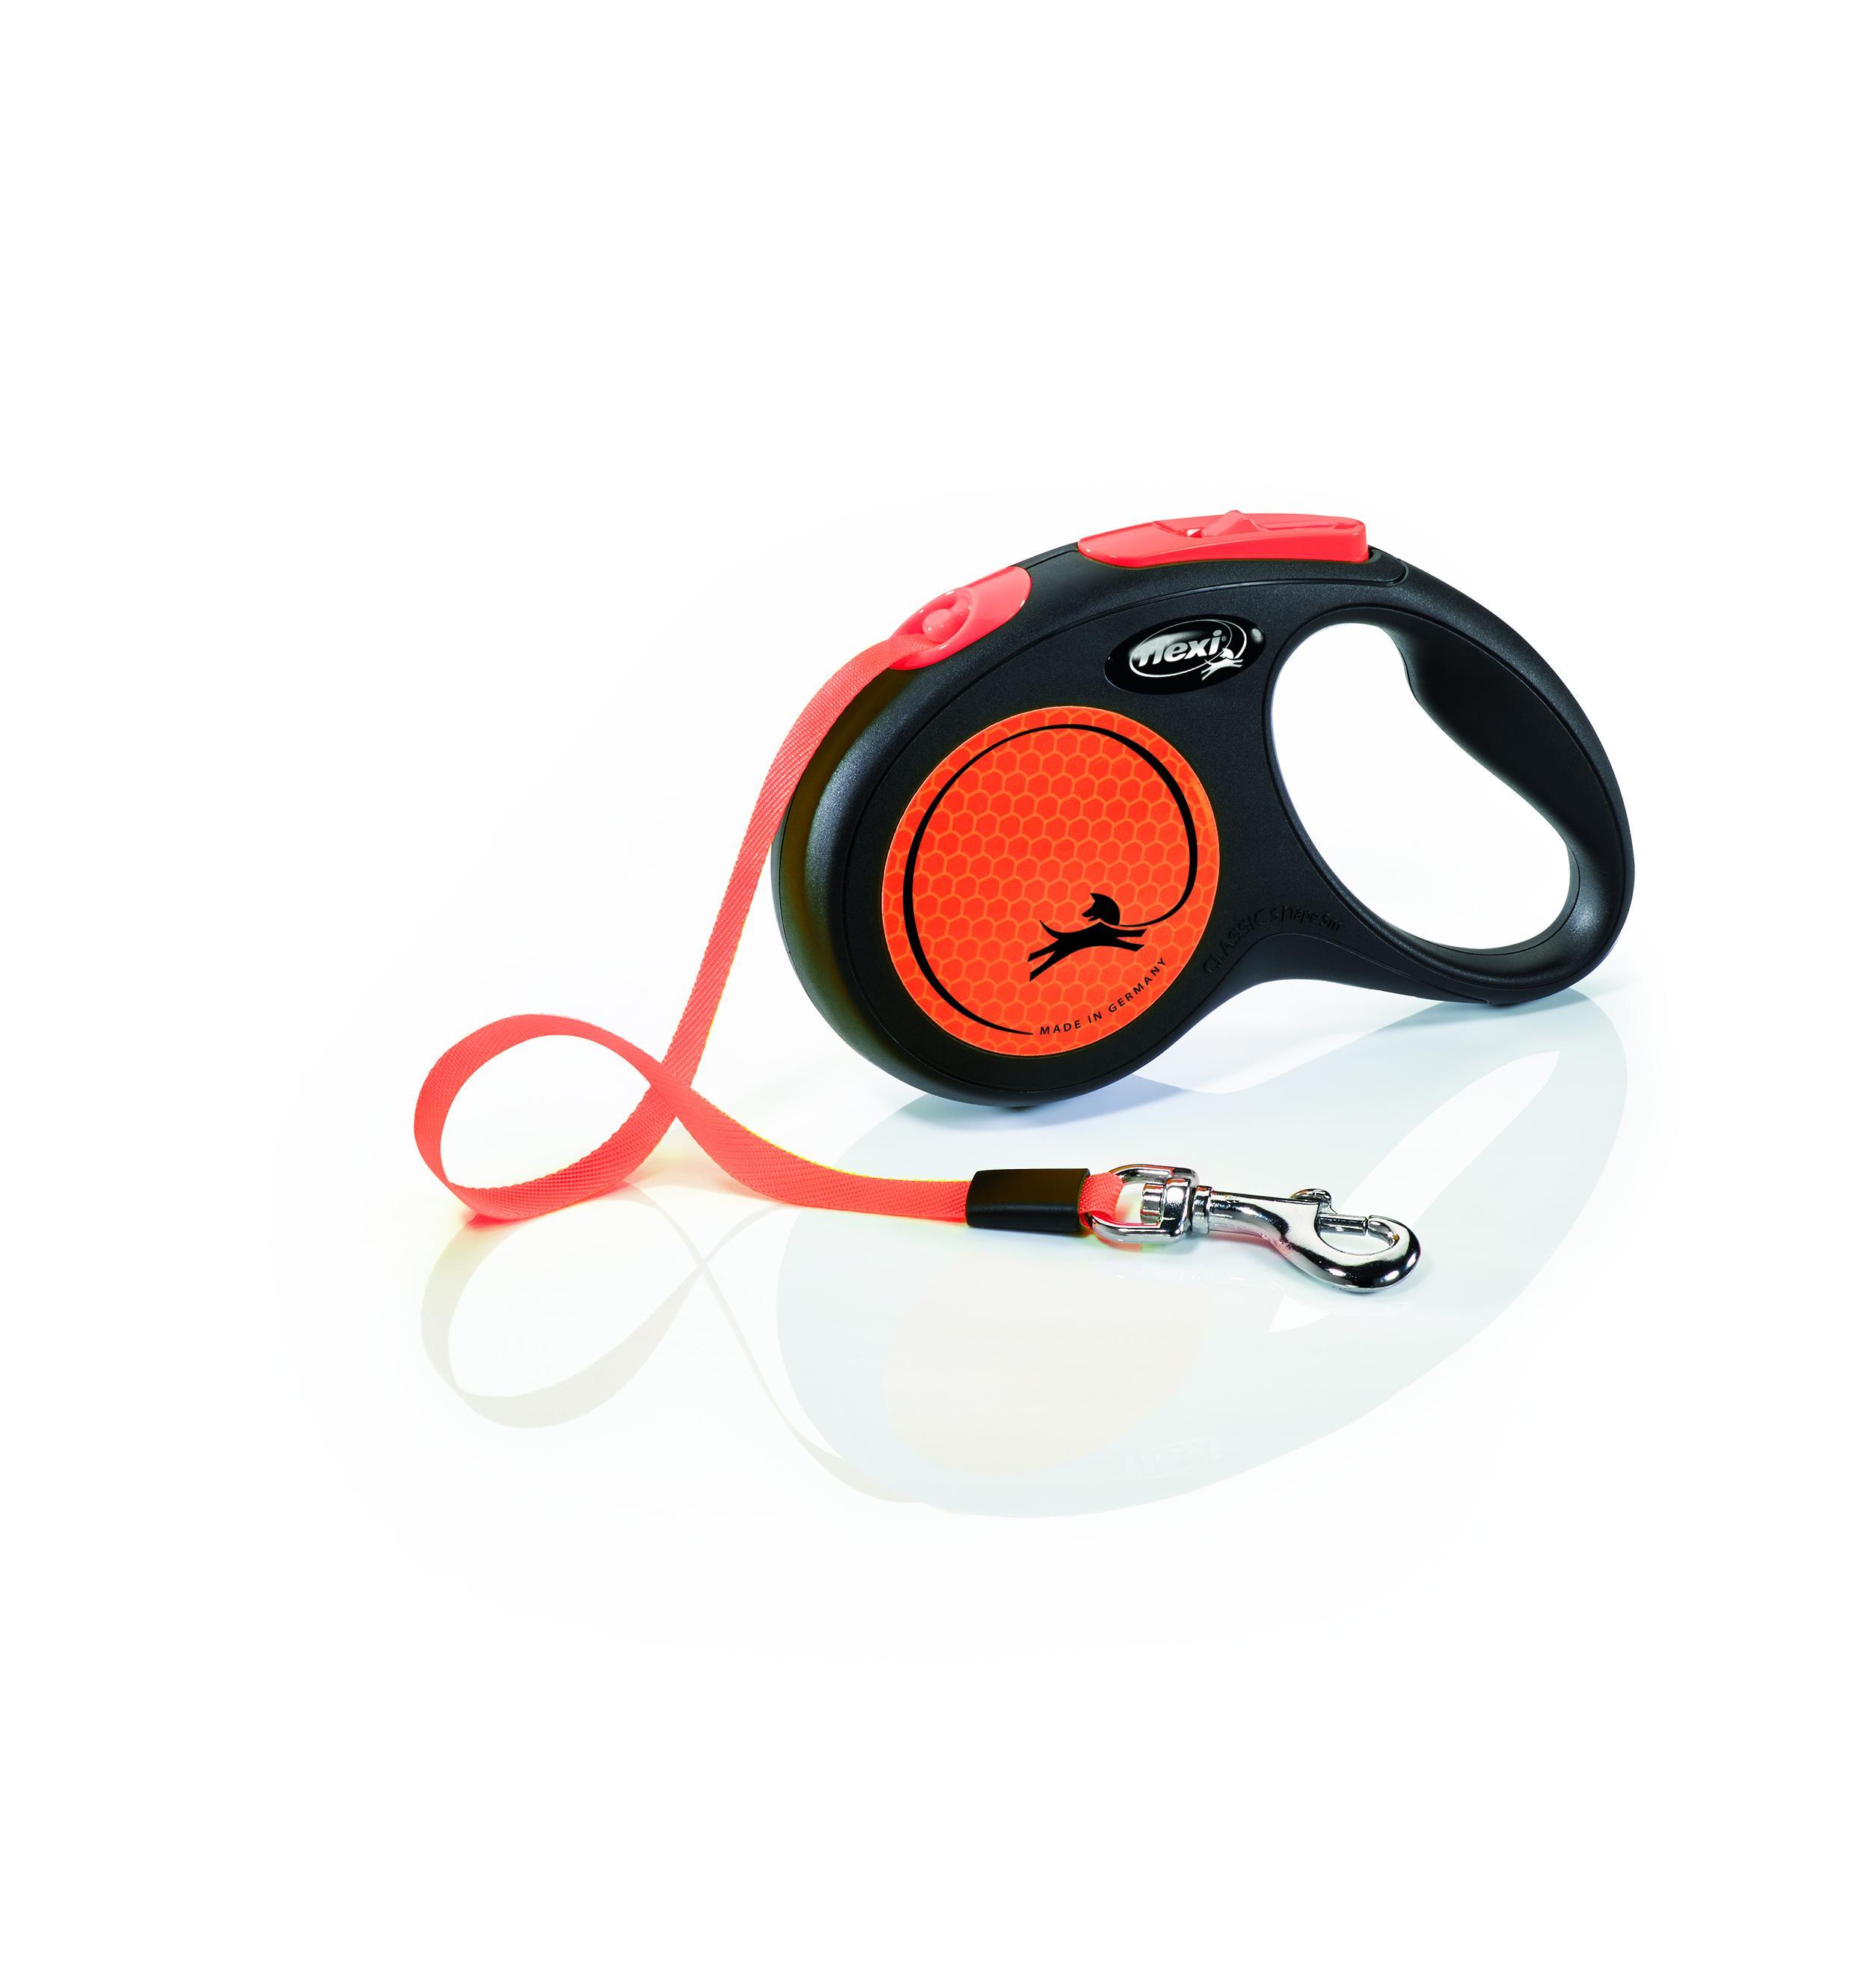 Flexi New Neon Tape Dog Leash, Black/Orange Image